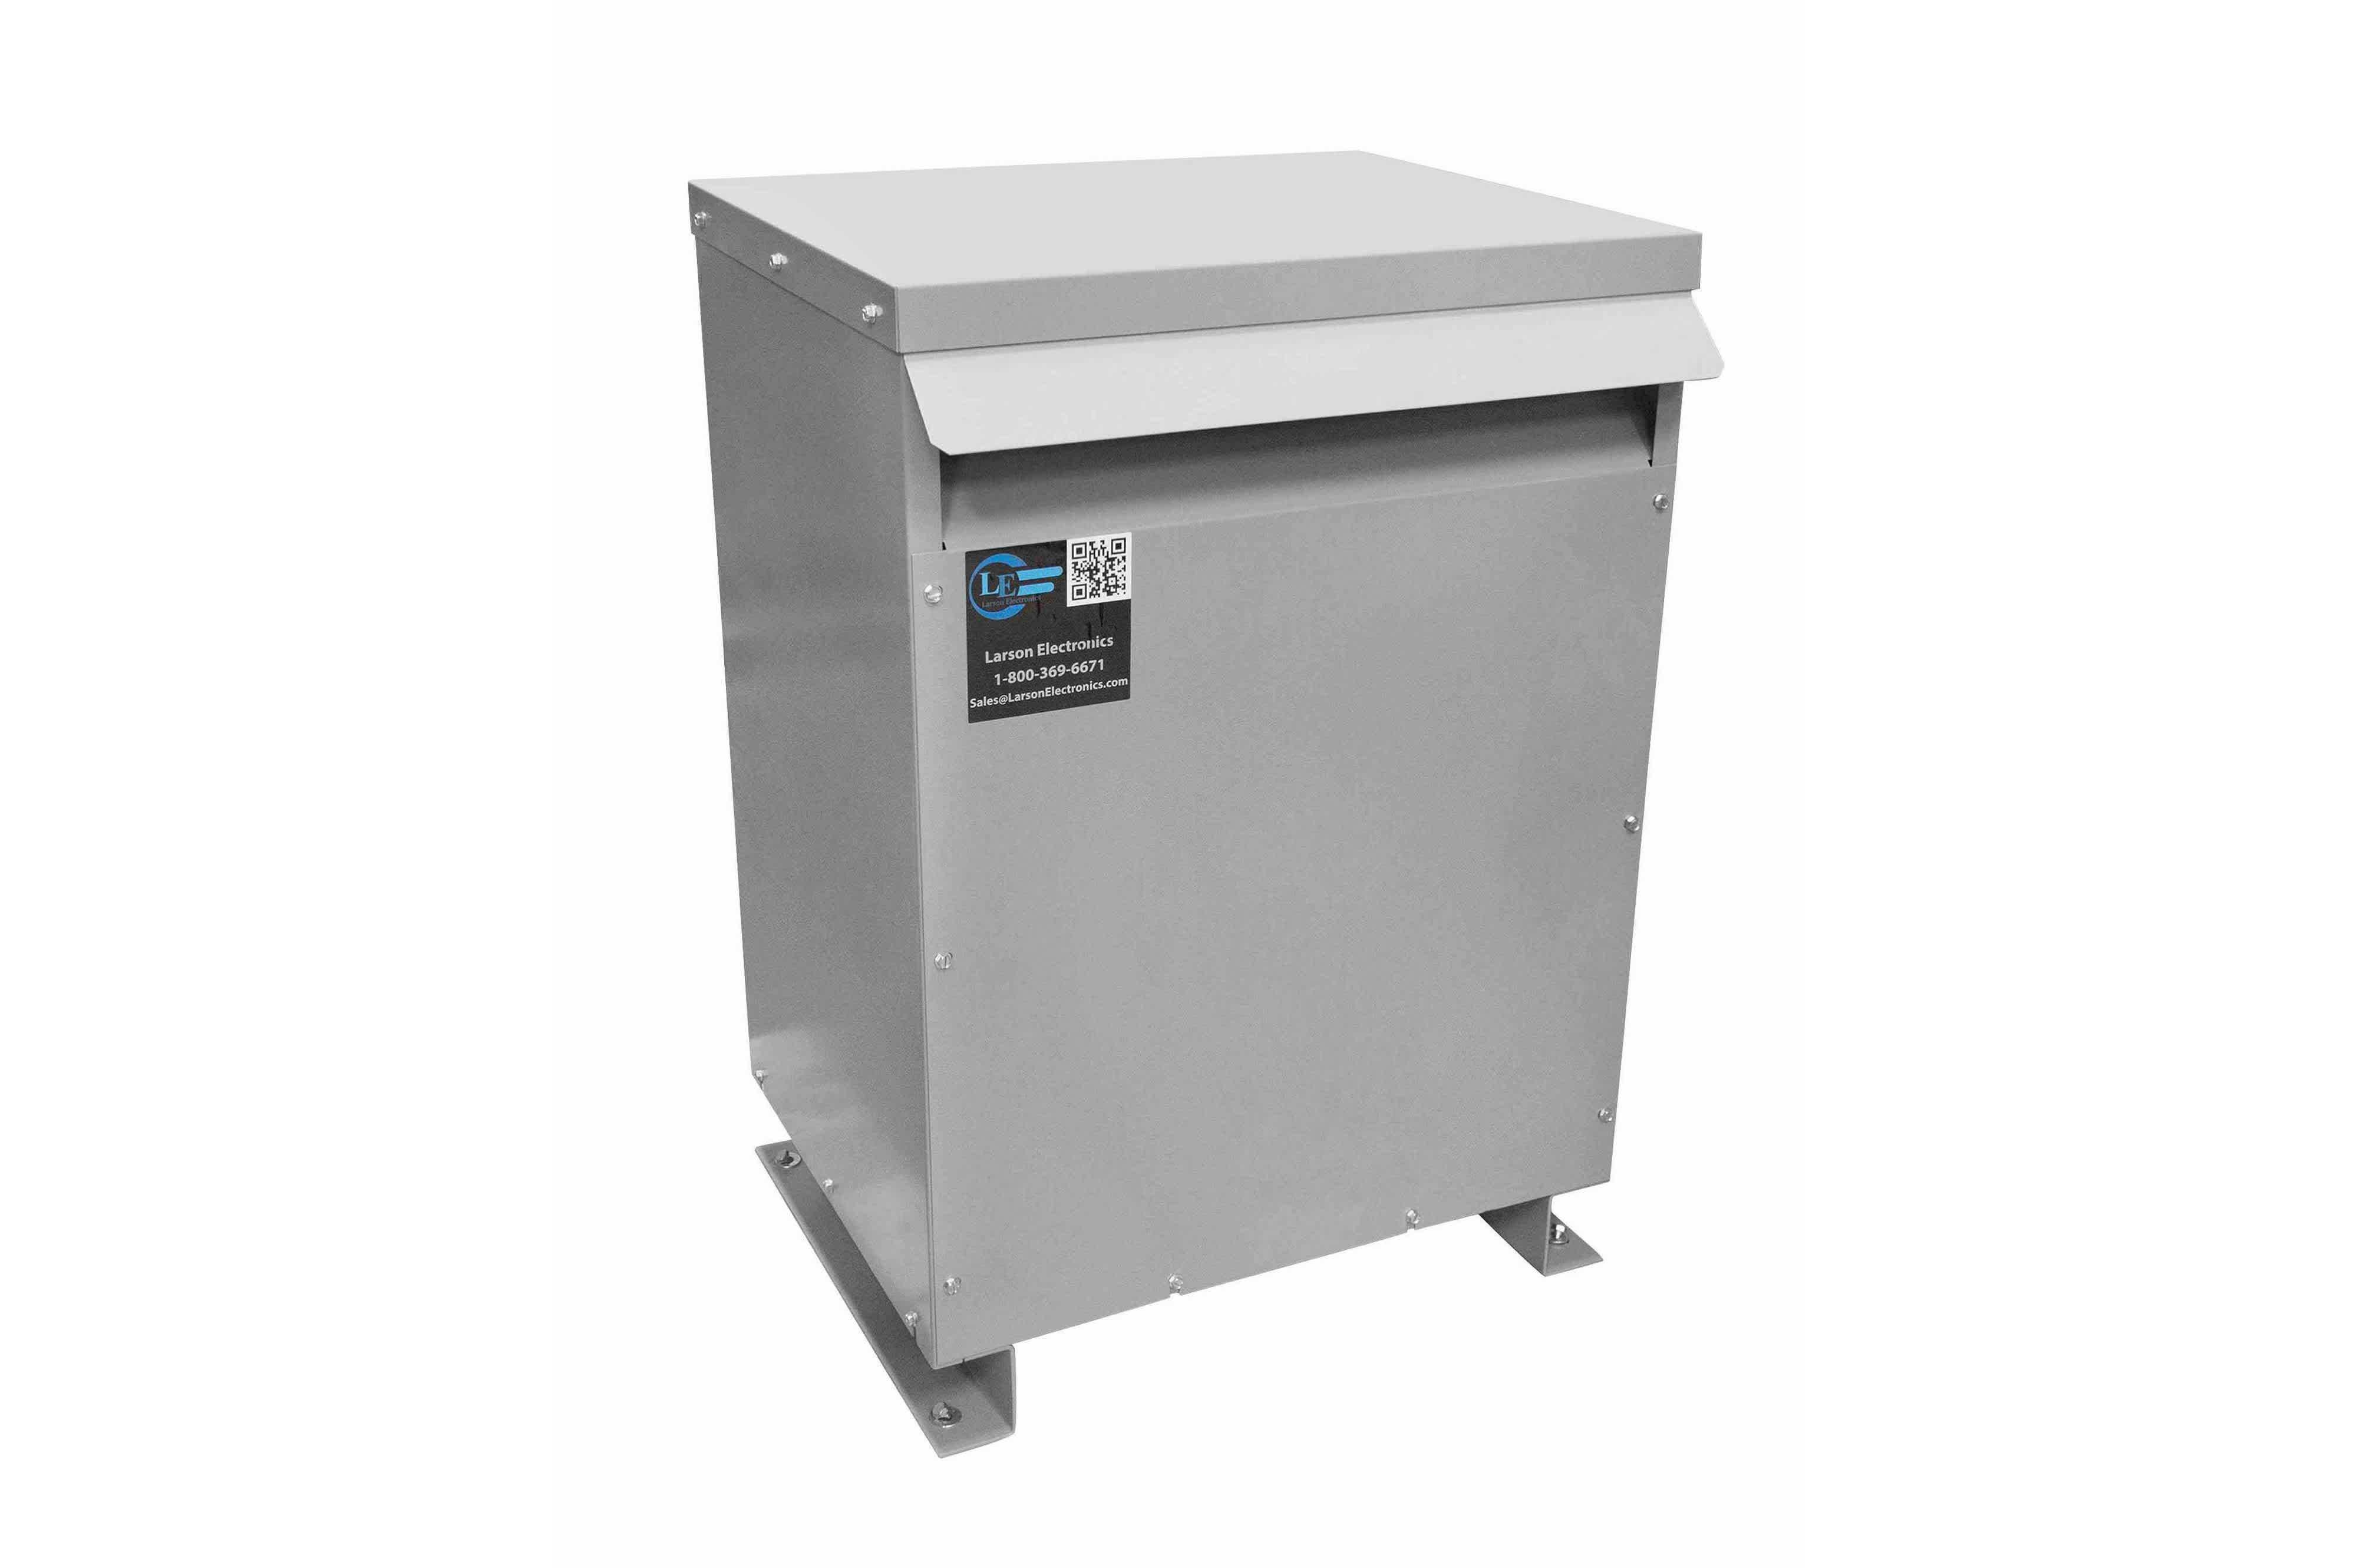 10 kVA 3PH Isolation Transformer, 208V Wye Primary, 380V Delta Secondary, N3R, Ventilated, 60 Hz